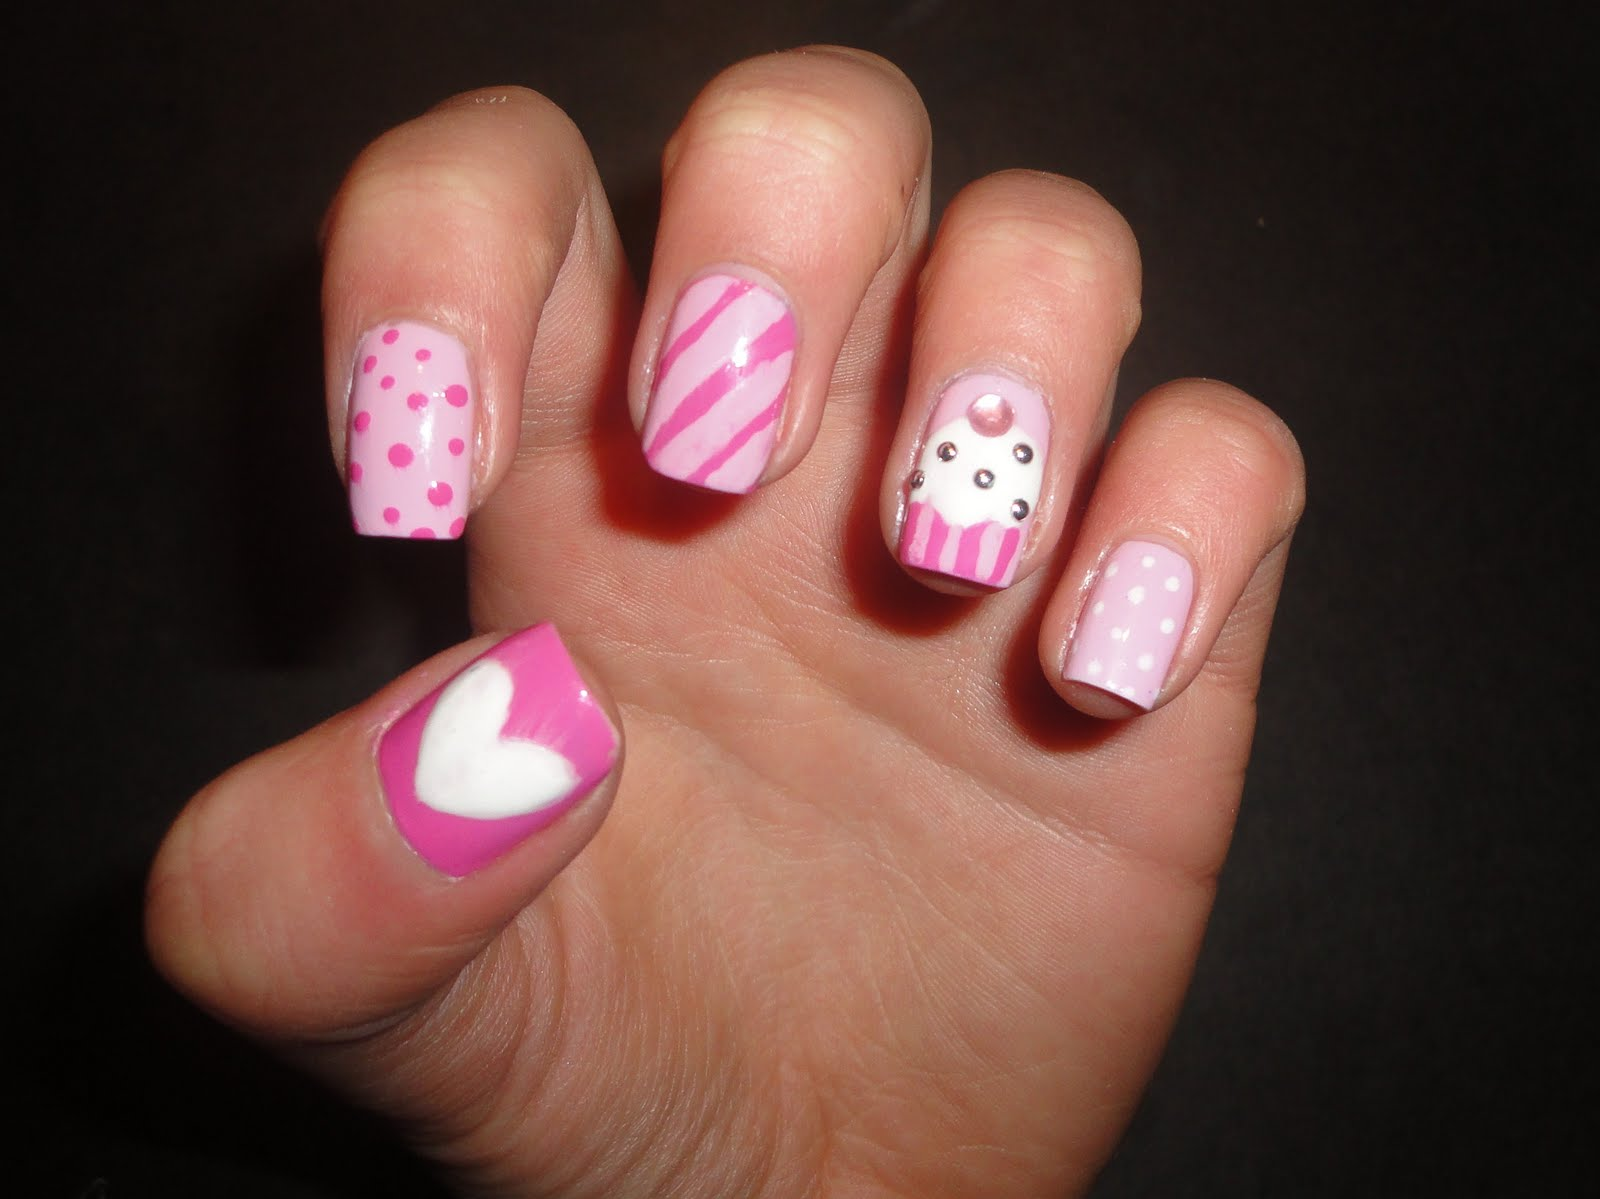 Uñas blancas | Short nail designs, Nails, Cute nails